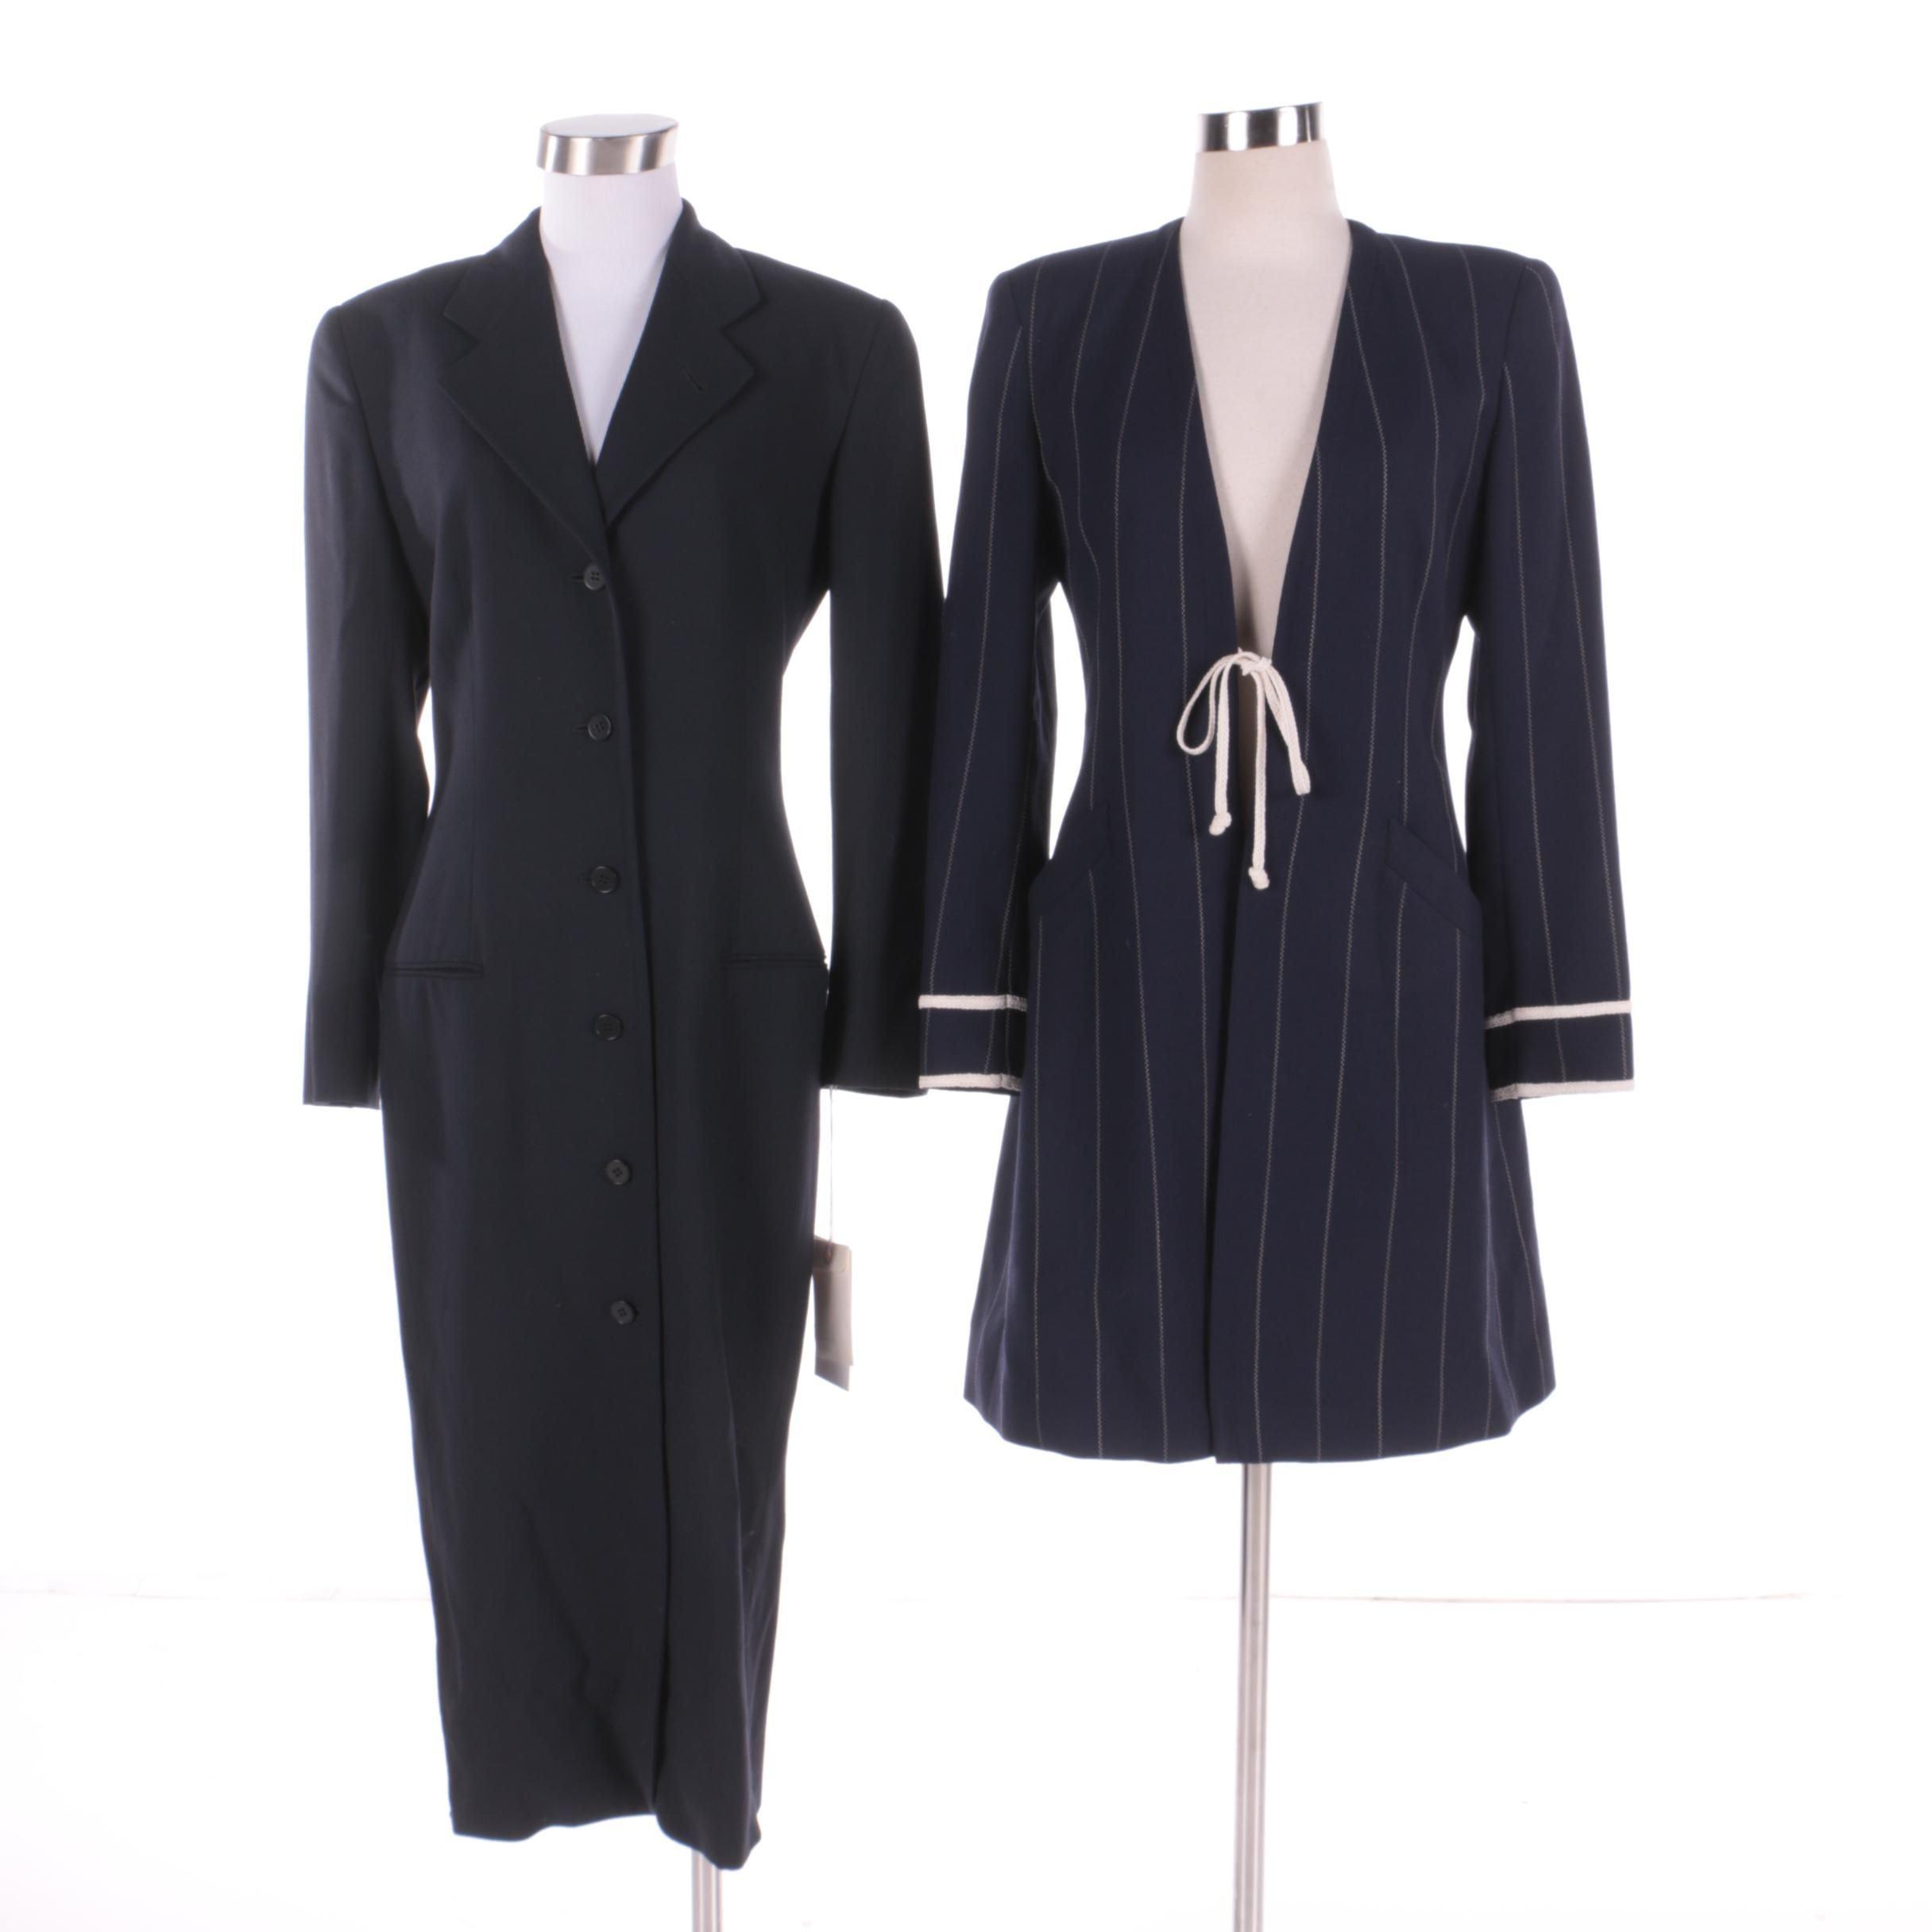 Women's Dresses Including Giorgio Armani and Calvin Klein Collection